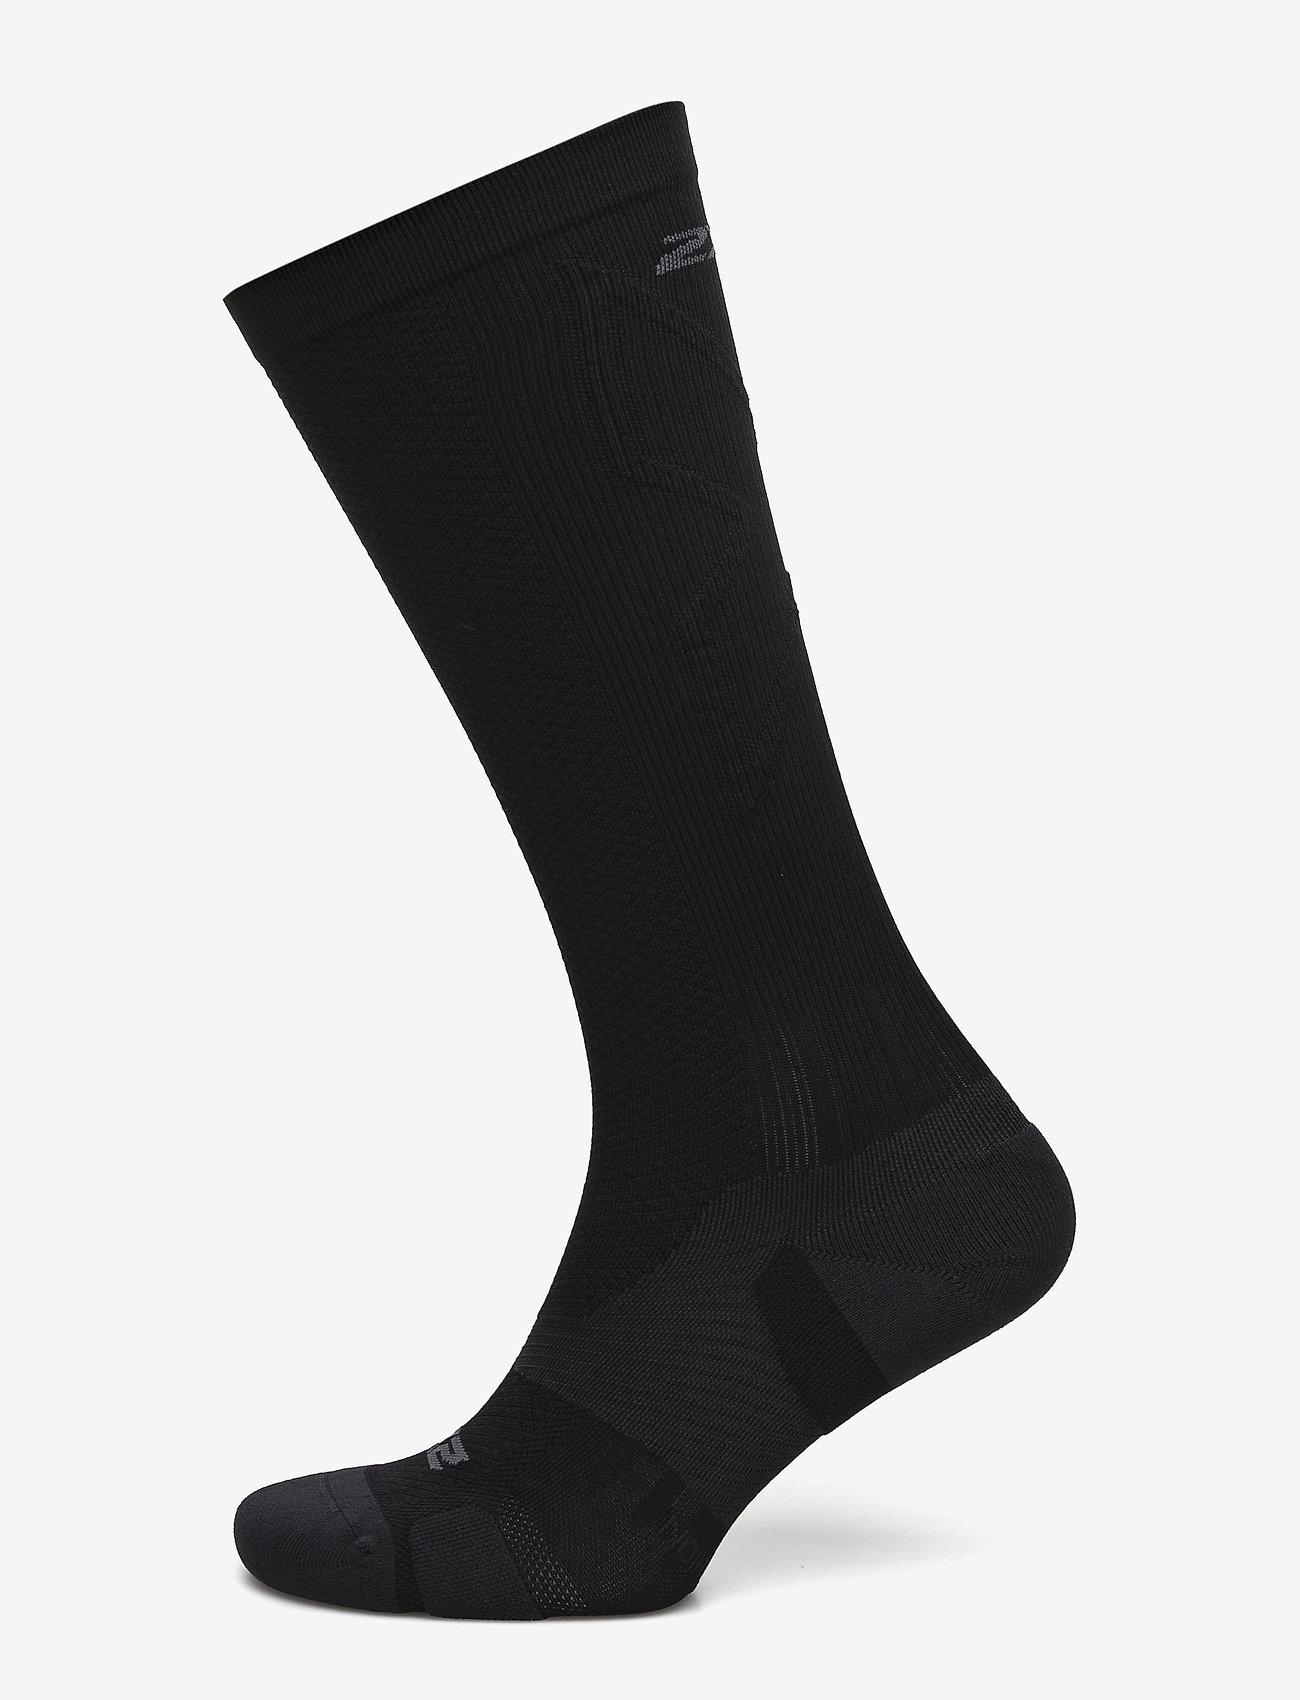 2XU - VECTR LIGHT CUSHION FULL LENG - tavalliset sukat - black/titanium - 0